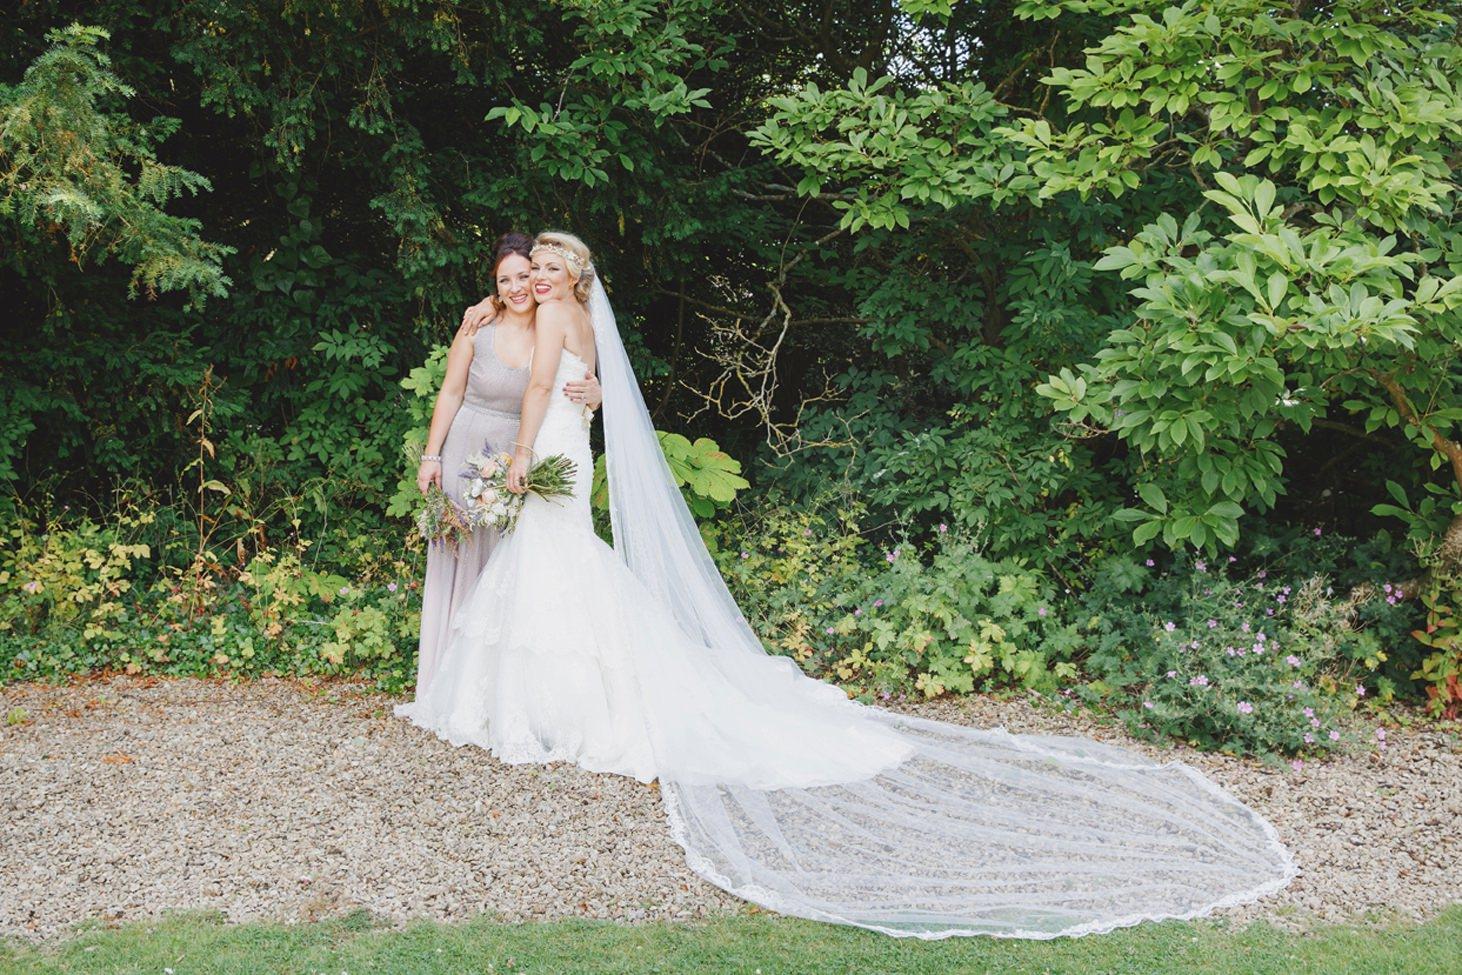 The Rectory Hotel Crudwell bride and bridesmaid sister